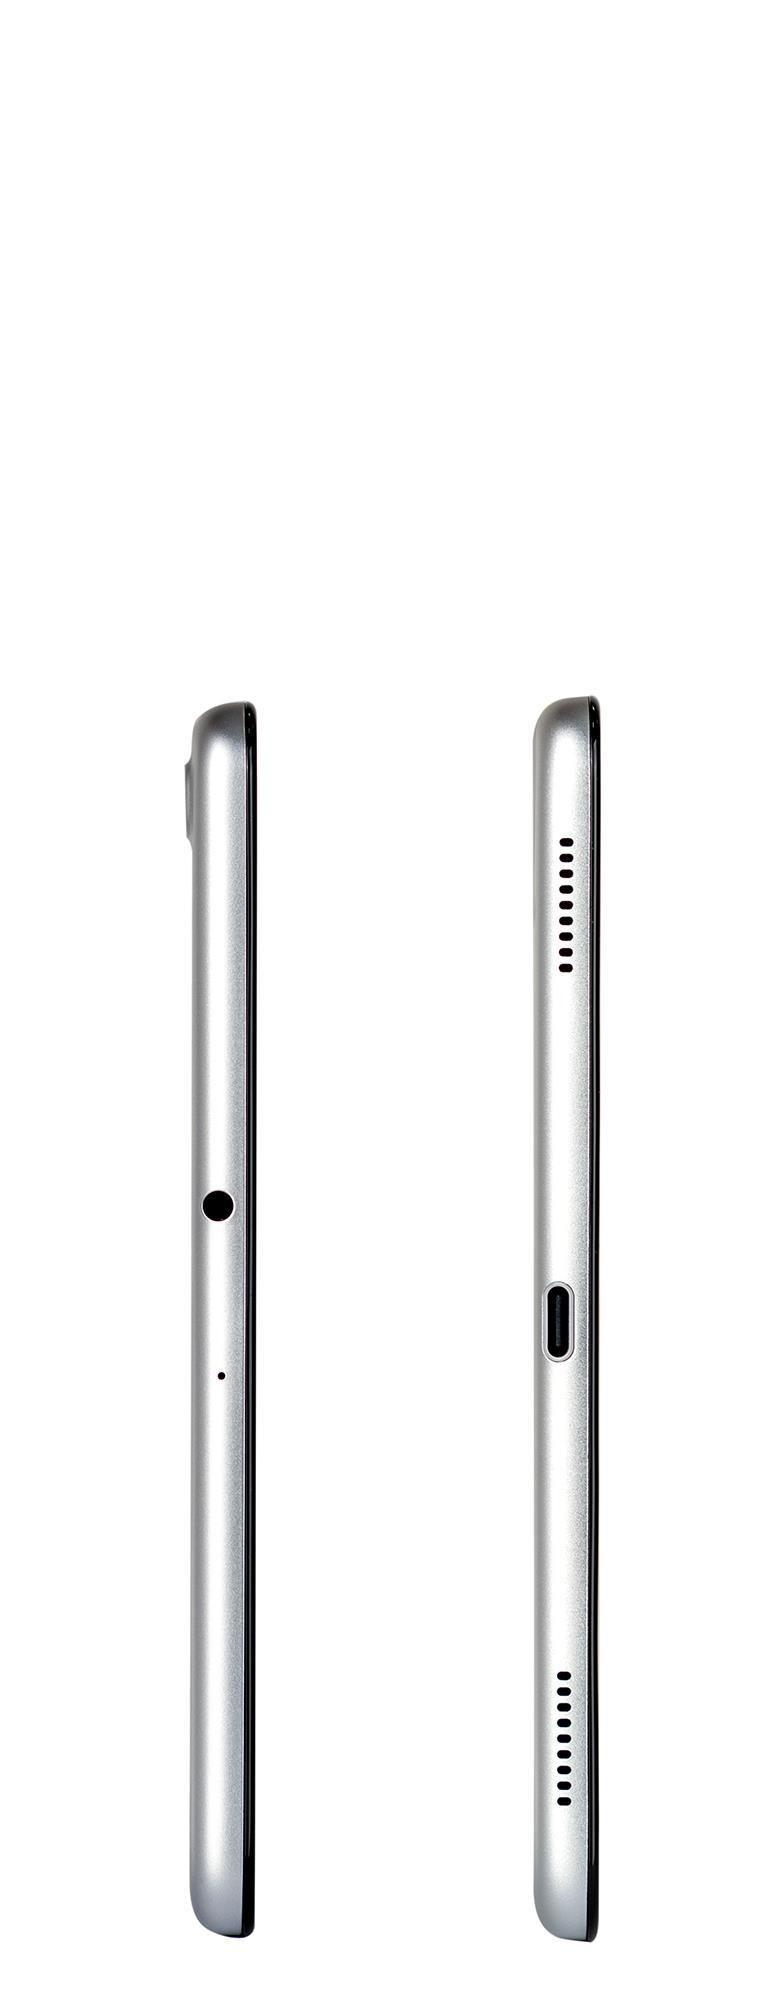 Samsung Galaxy Tab A 10.1 LTE (2019) 32GB silver Planšetdators